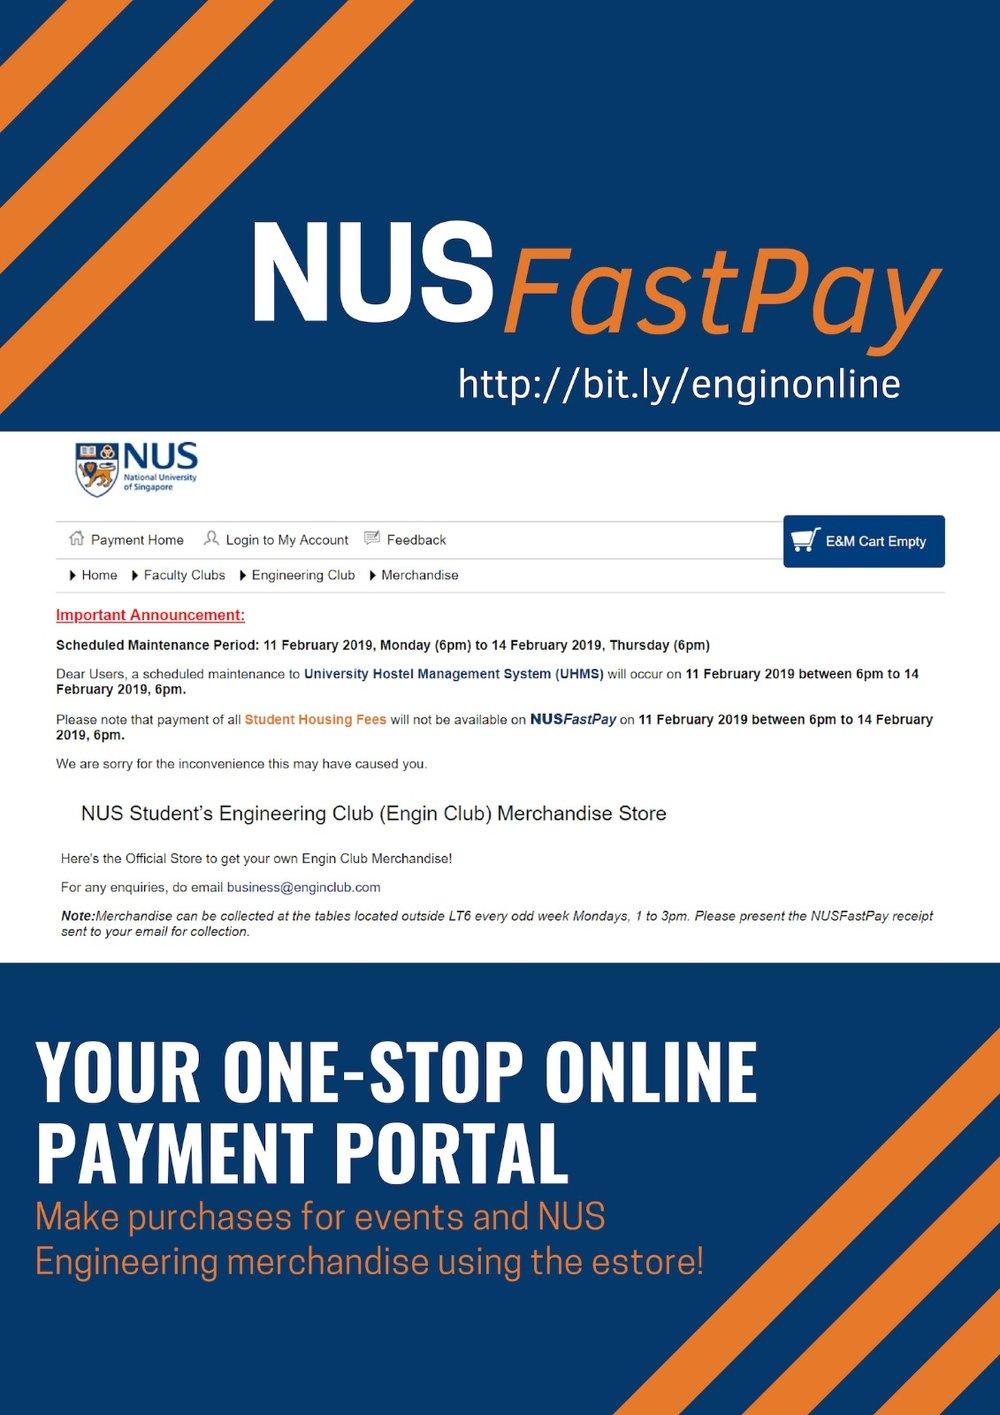 NUS FastPay